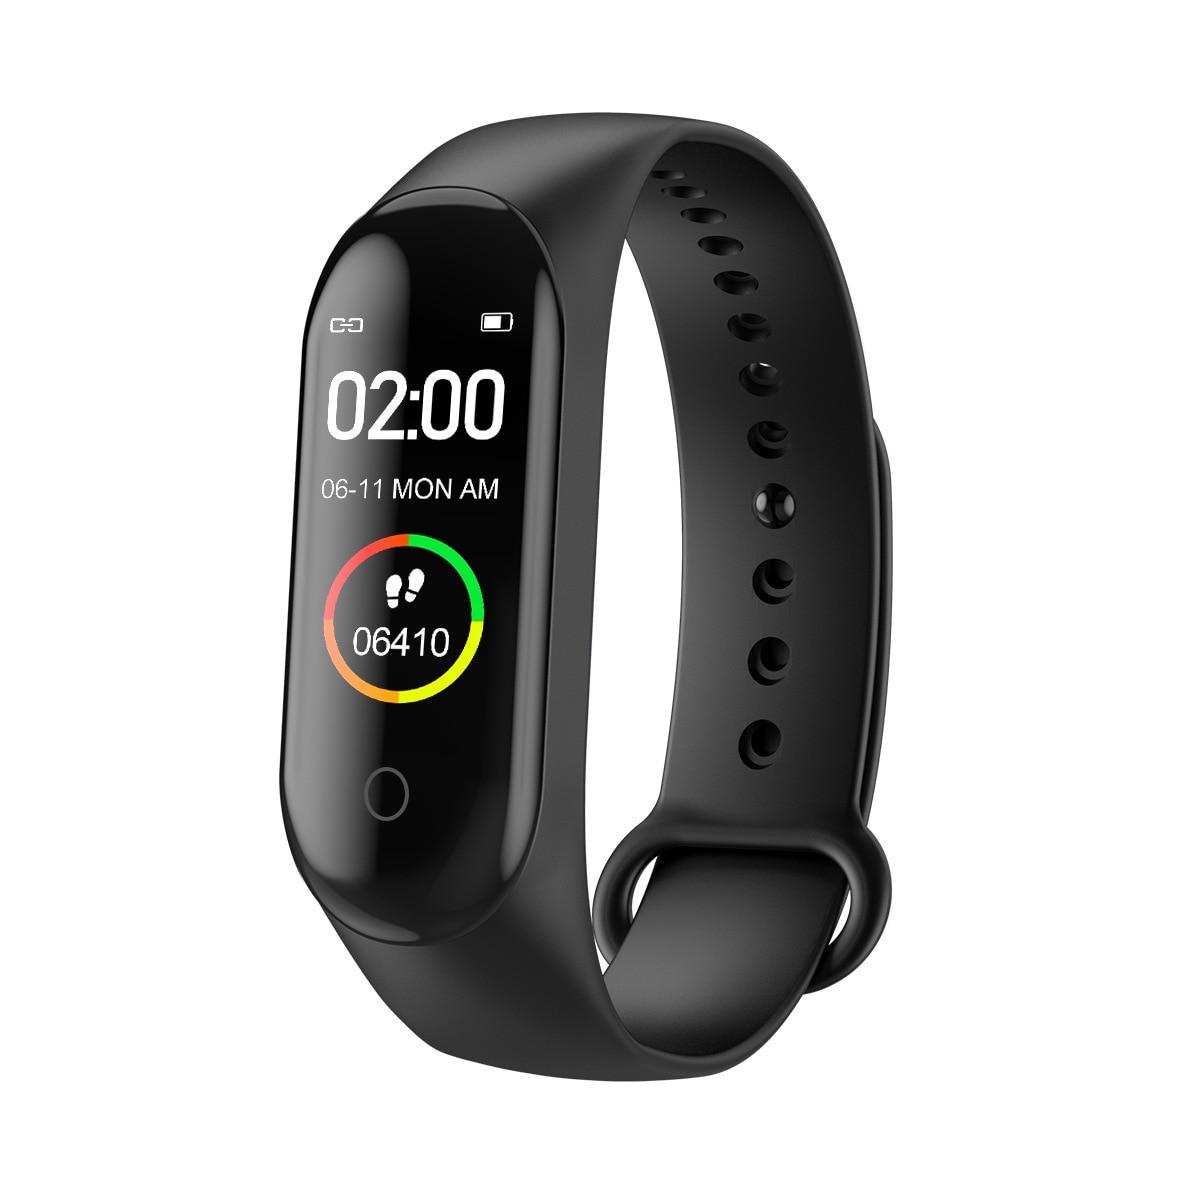 Ha80ae74eab054094befc204b937fde52p M4 Smart Band Wristbands Fitness Tracker Health Heart Rate Blood Pressure Bluetooth Sports Bracelet smartband